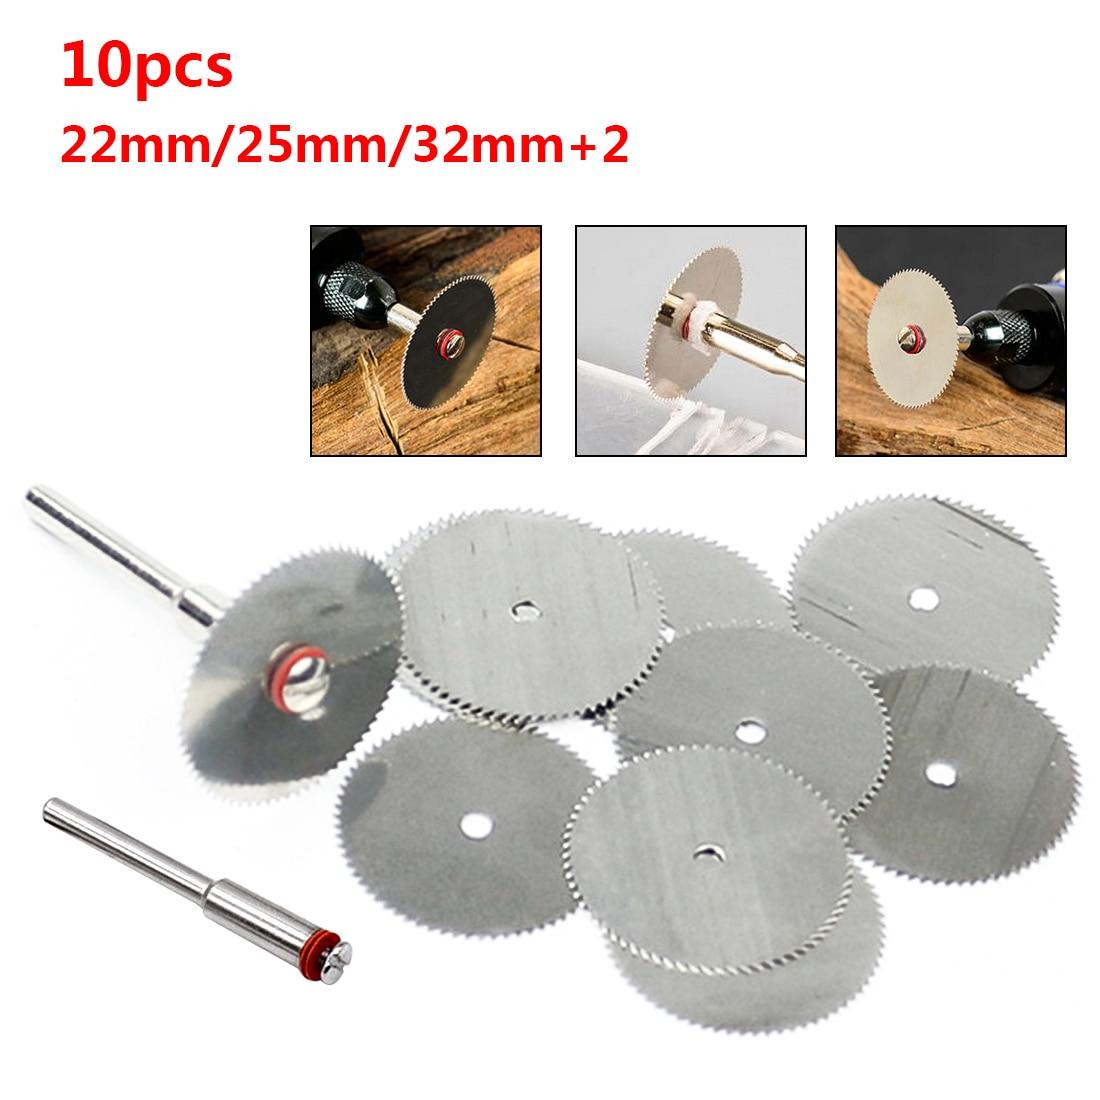 10PCS/SET Wood Saw Blade Disc + 2 X Rod Dremel Rotary Cutting Tool 22/25/32mm